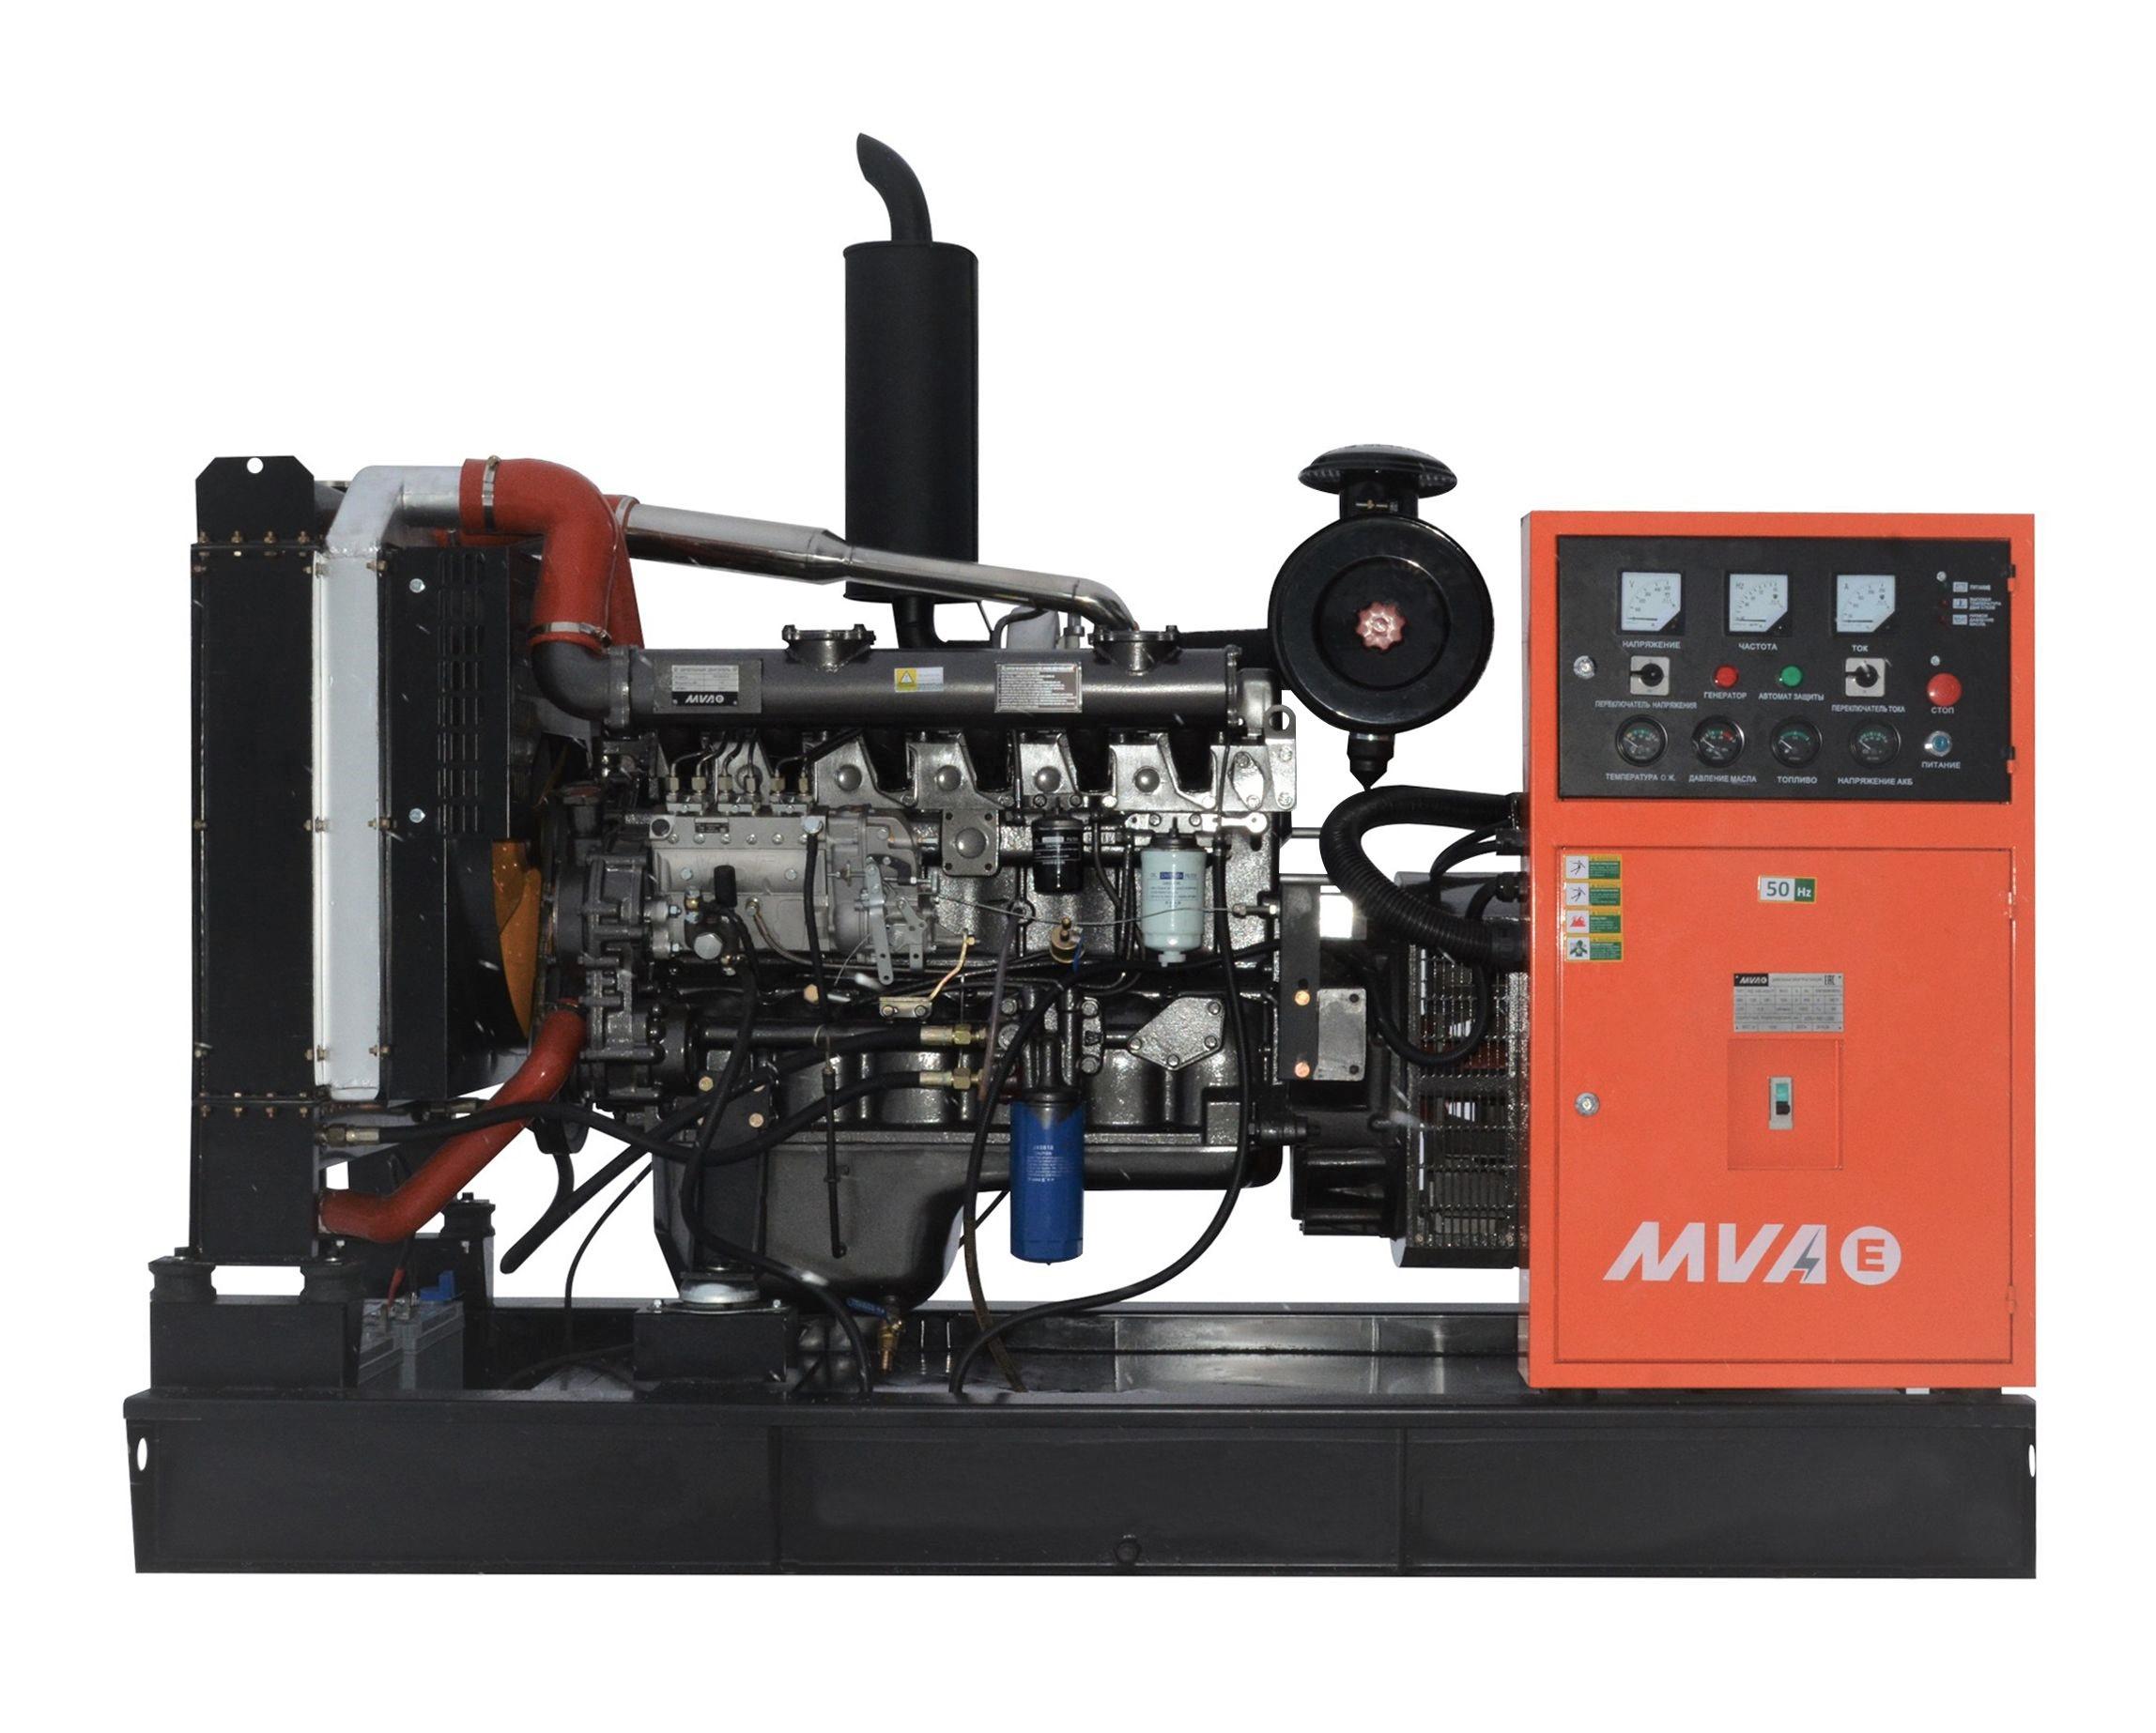 Дизель-генератор Mvae АД-200-400-Р